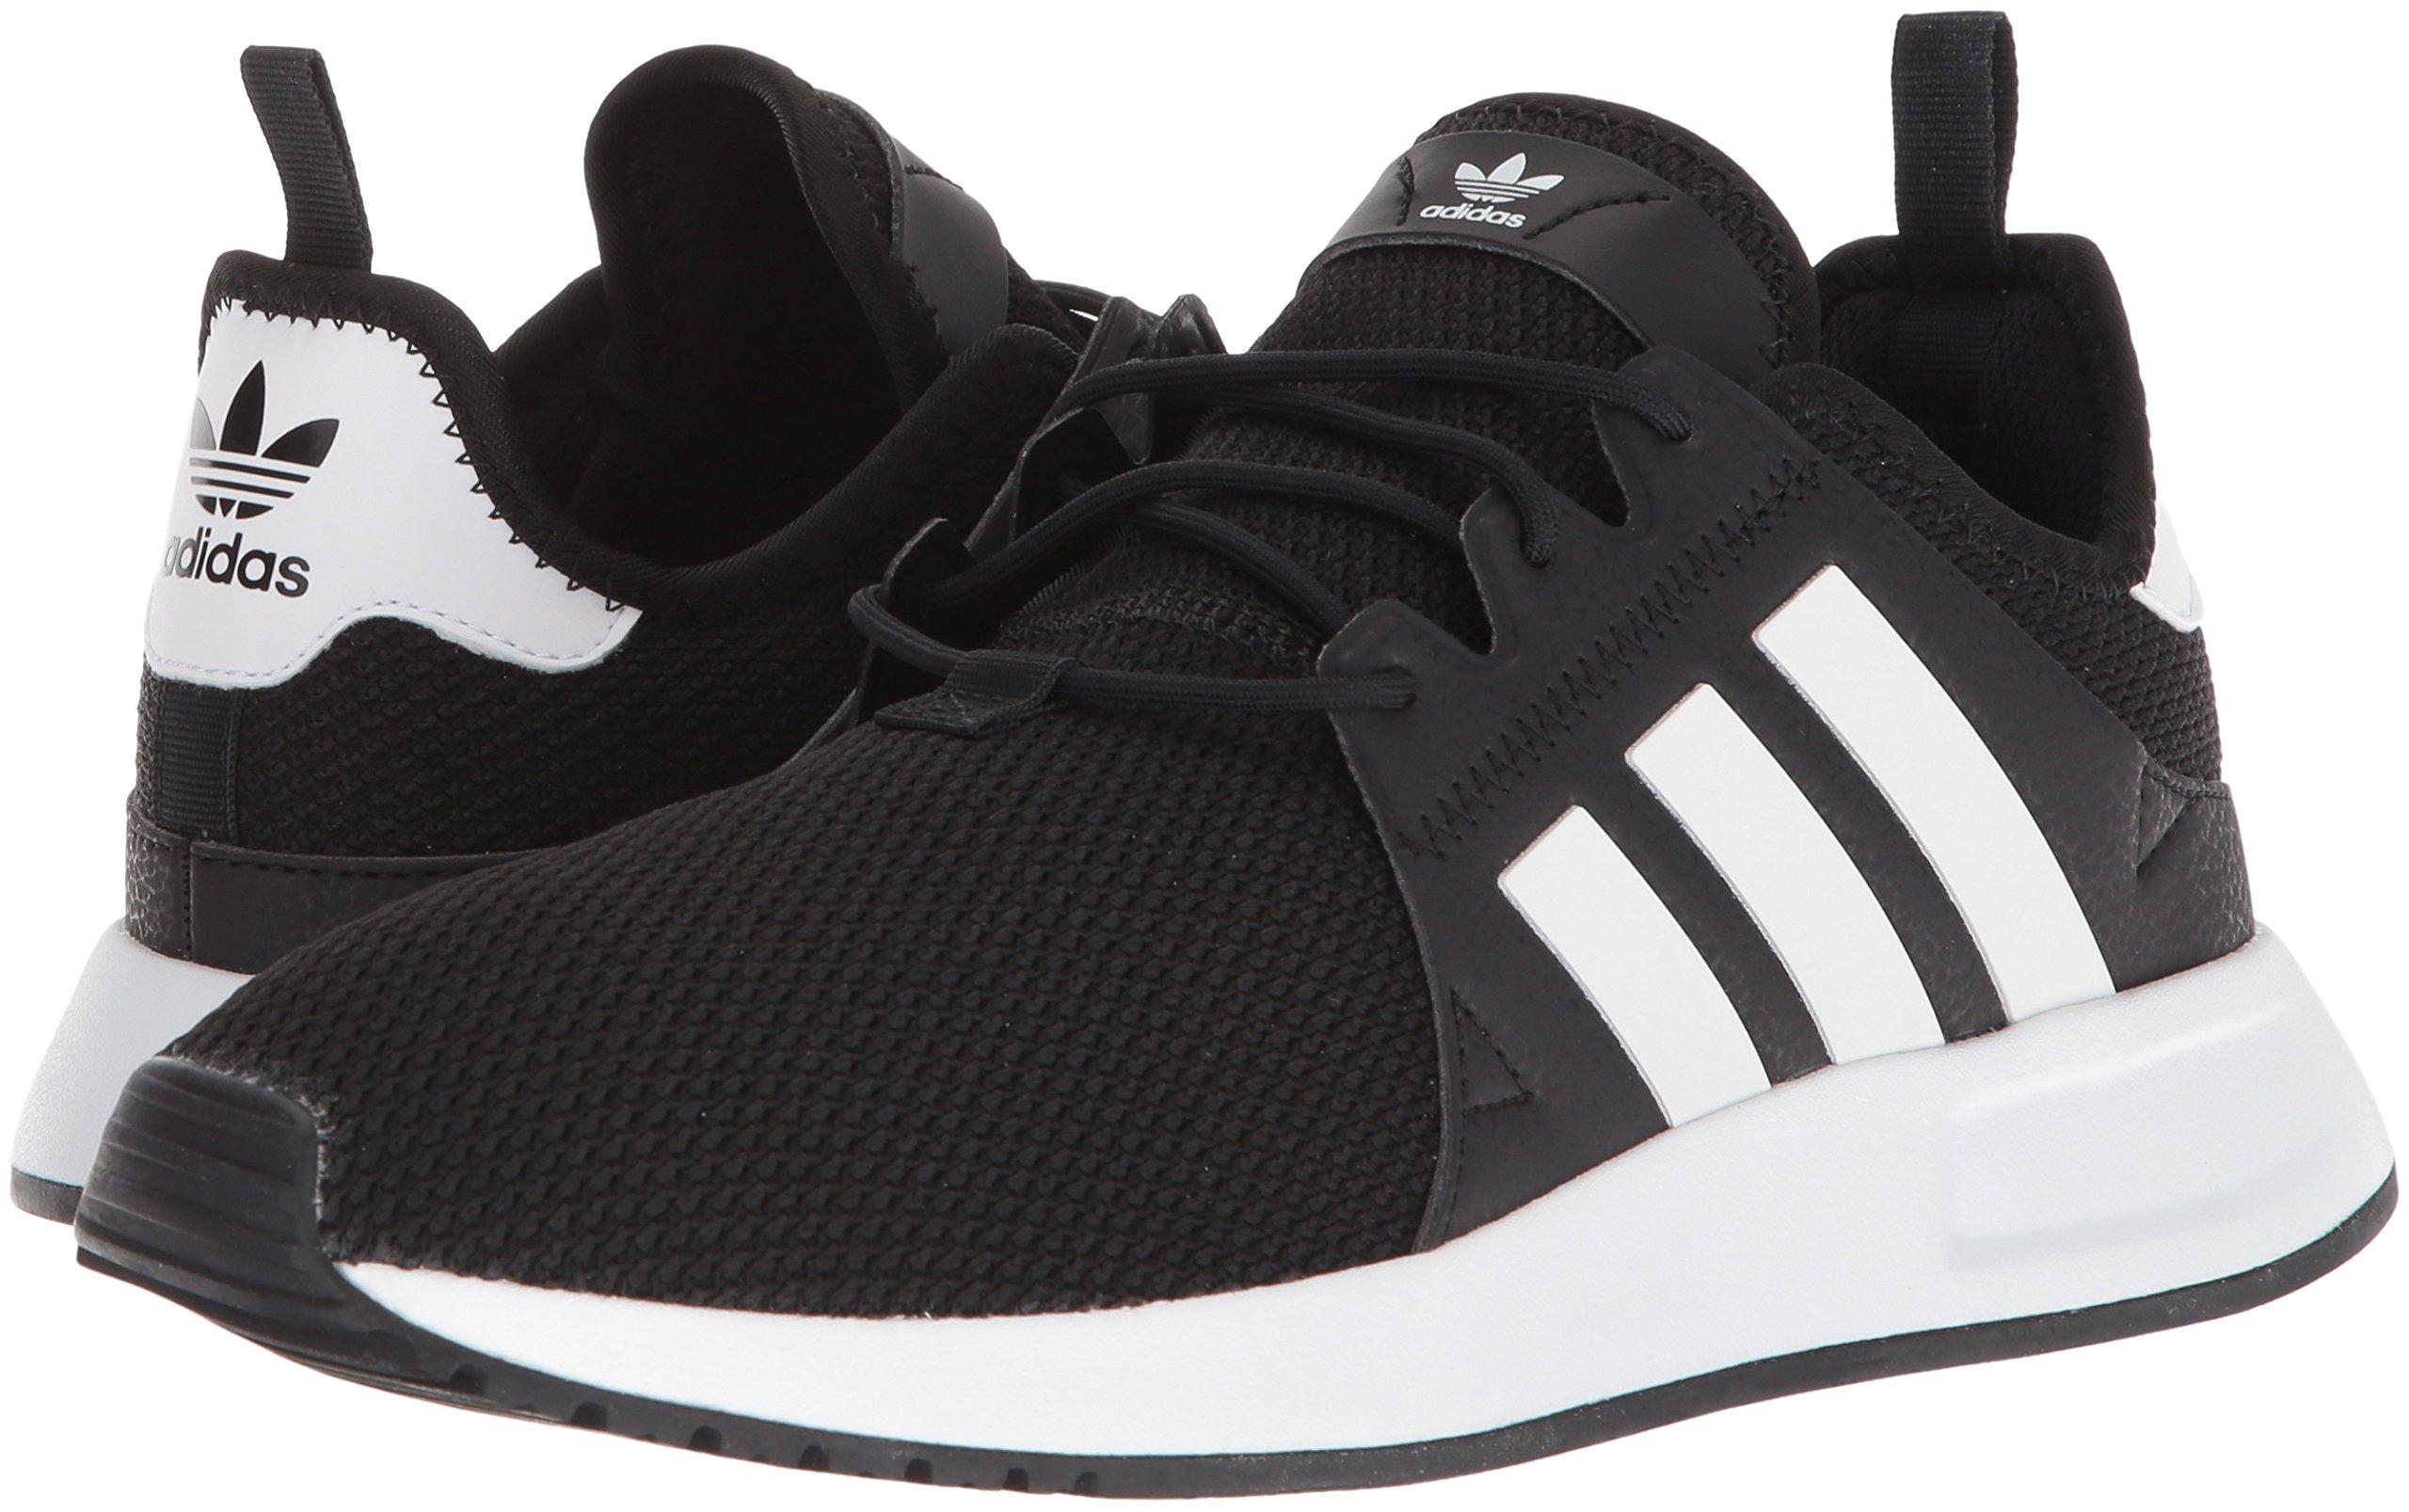 adidas Originals Mens X_PLR Running Shoe White/Black, 5 M US by adidas Originals (Image #6)